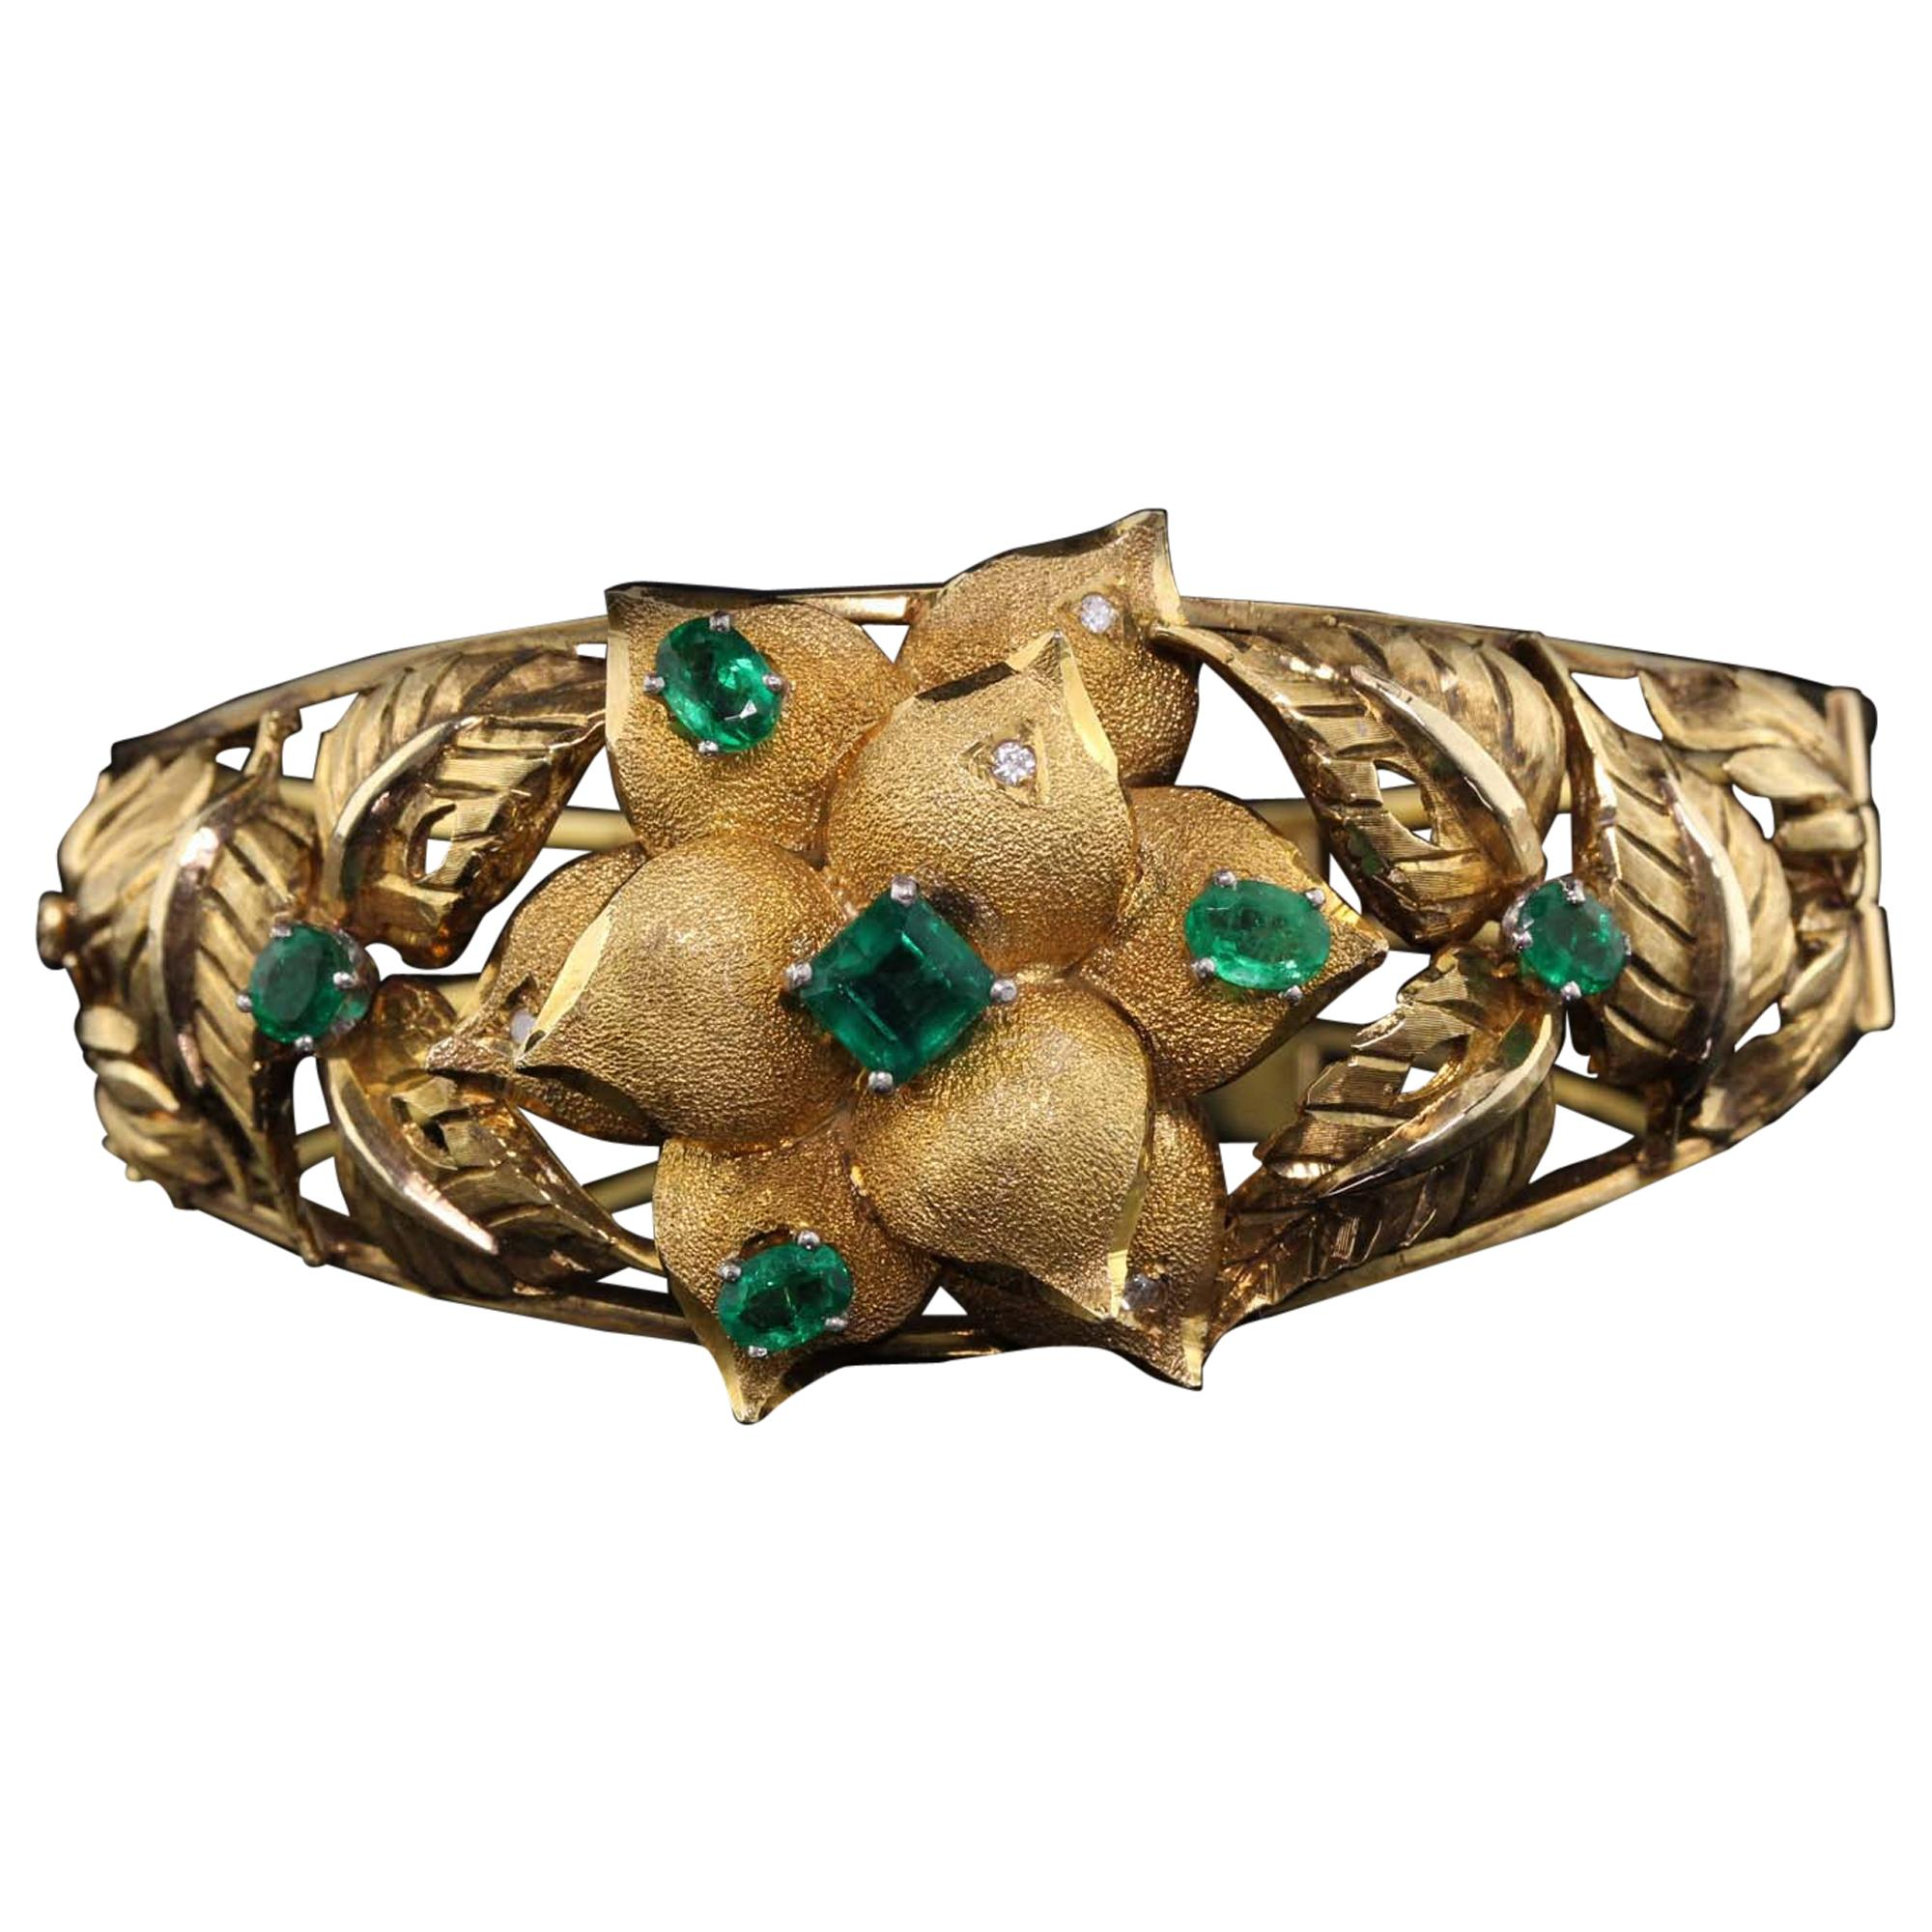 Vintage 18 Karat Yellow Gold Floral Columbian Emerald and Diamond Cuff Bracelet